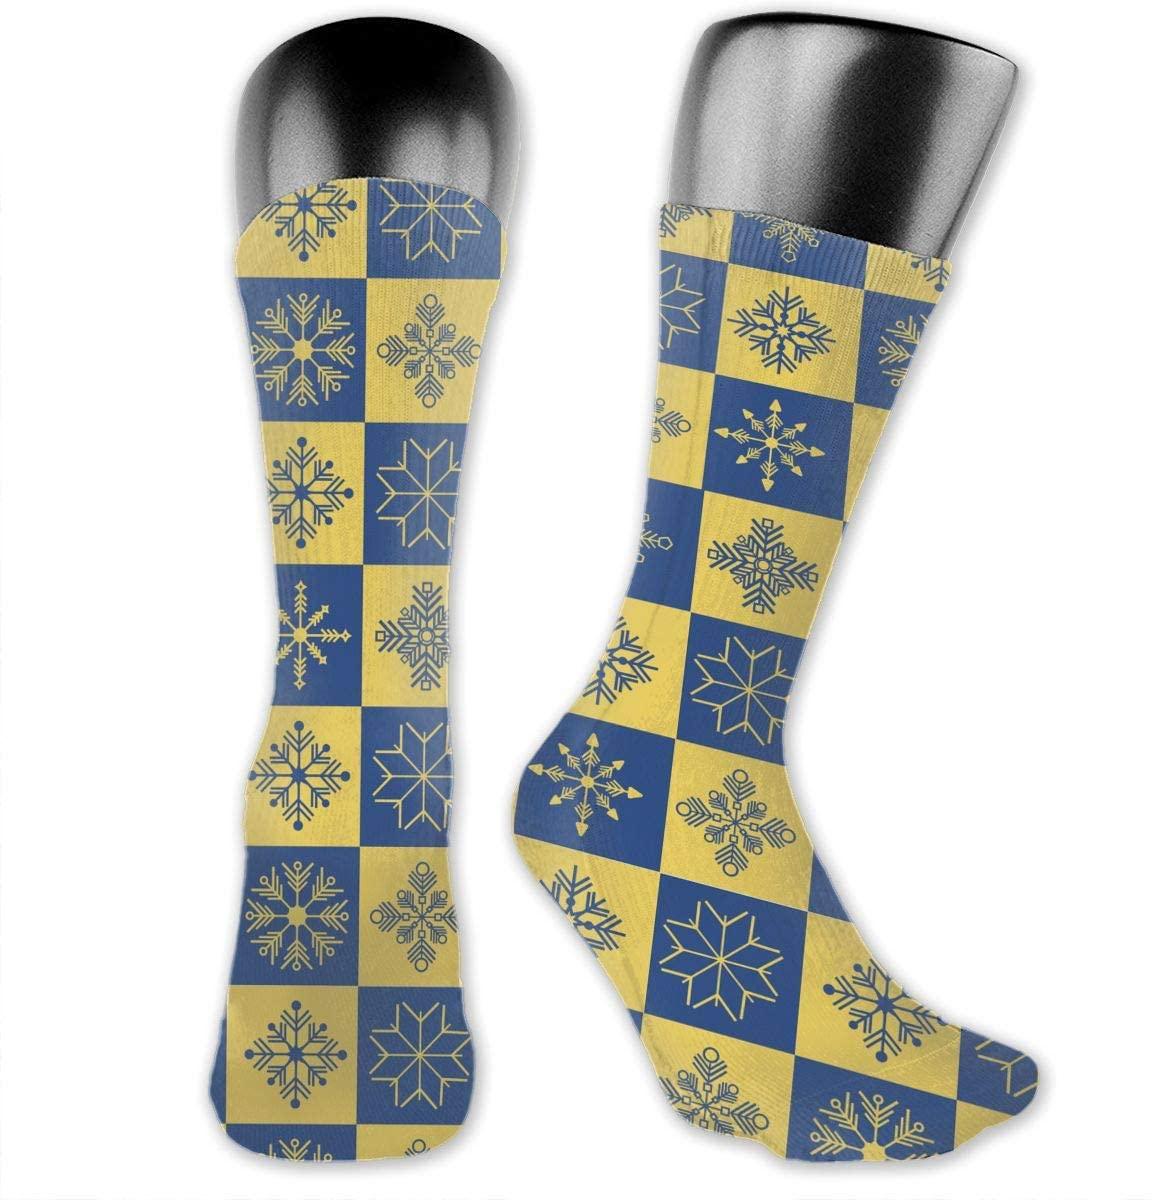 Square Snowflake Unisex Outdoor Long Socks Sport Athletic Crew Socks Stockings